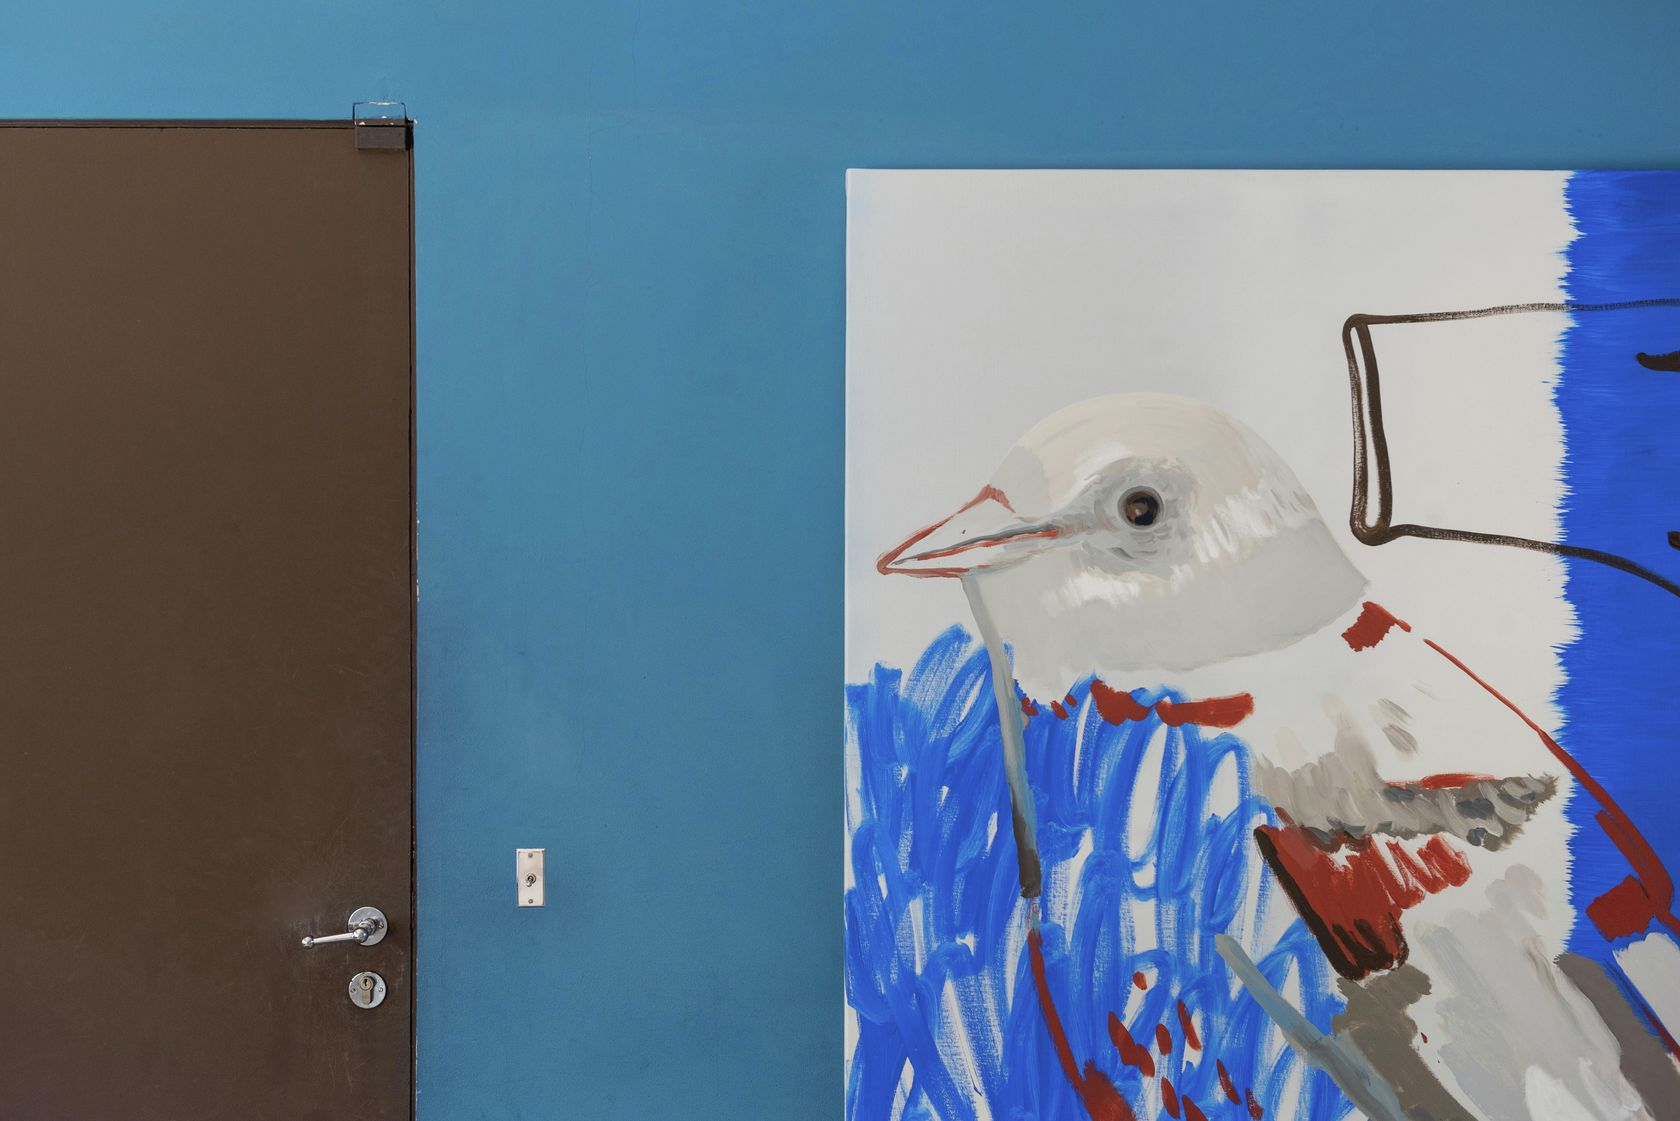 Françoise Pétrovitch, Oiseau-gant, 2019 Habiter la Villa, Villa Savoye, Poissy (FR) 18 septembre 2020 - 24 janvier 2021 © Hervé Plumet